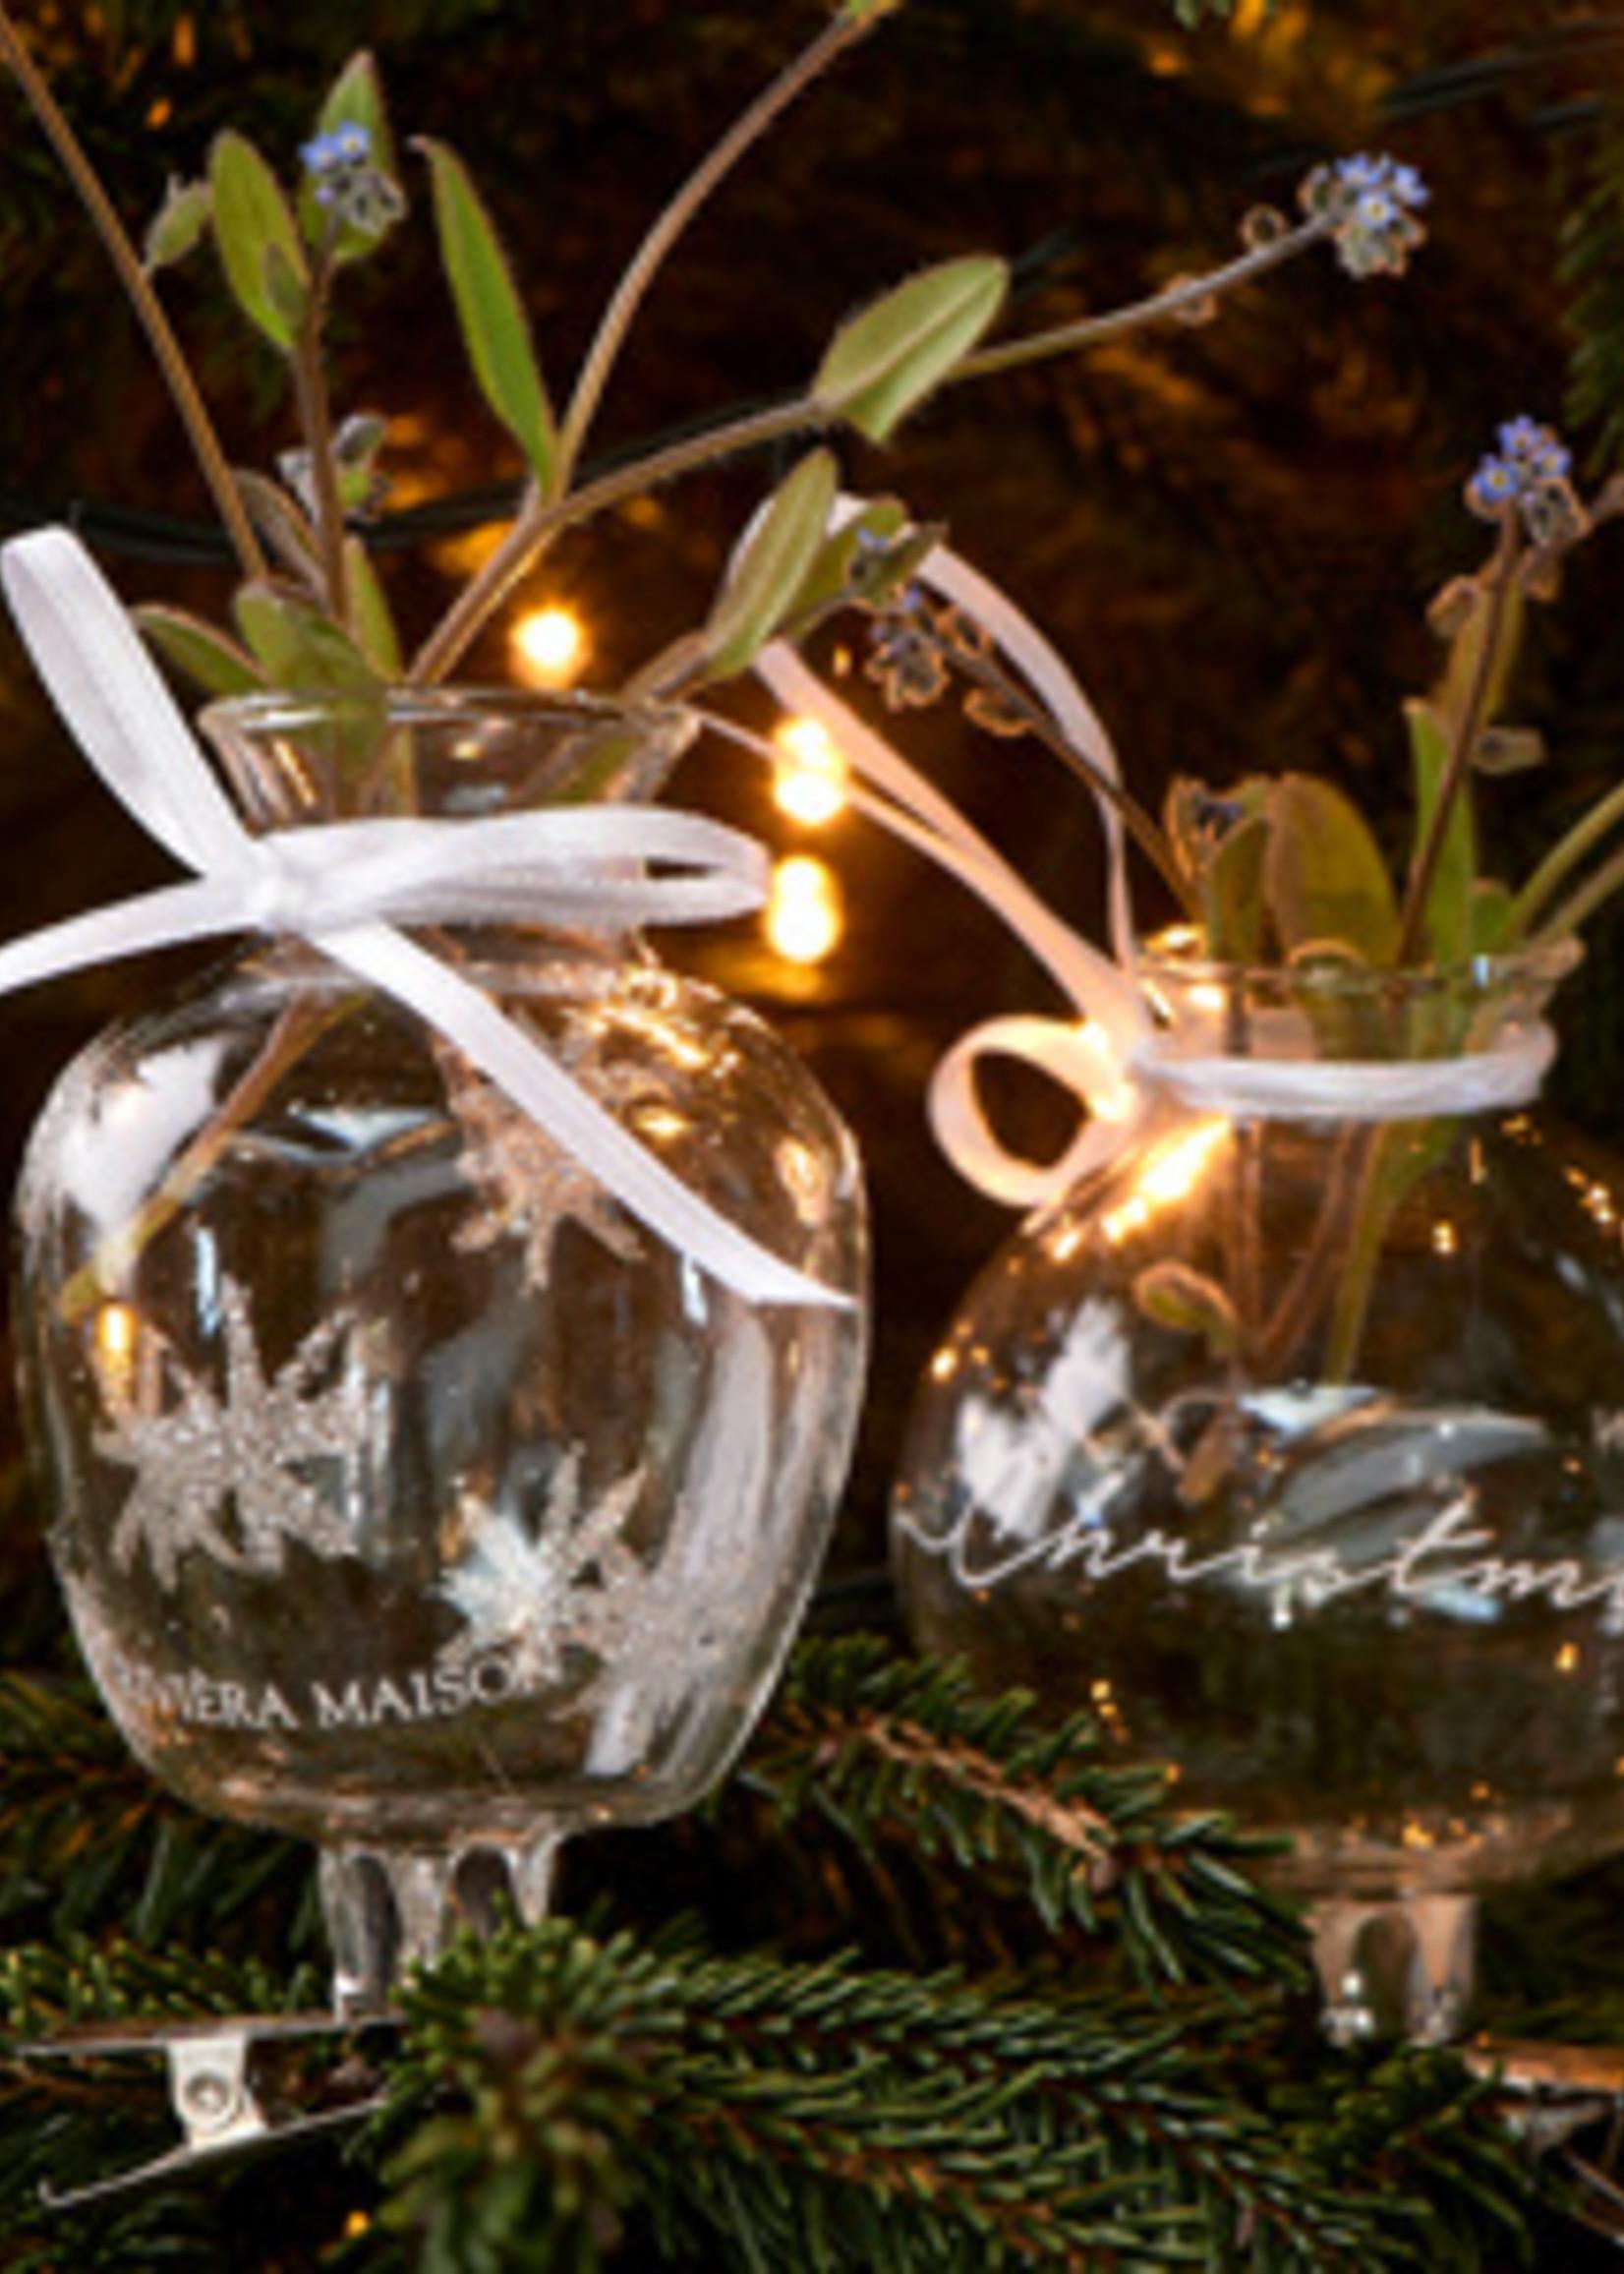 Riviera Maison Merry Christmas Mini Vases 2 pieces